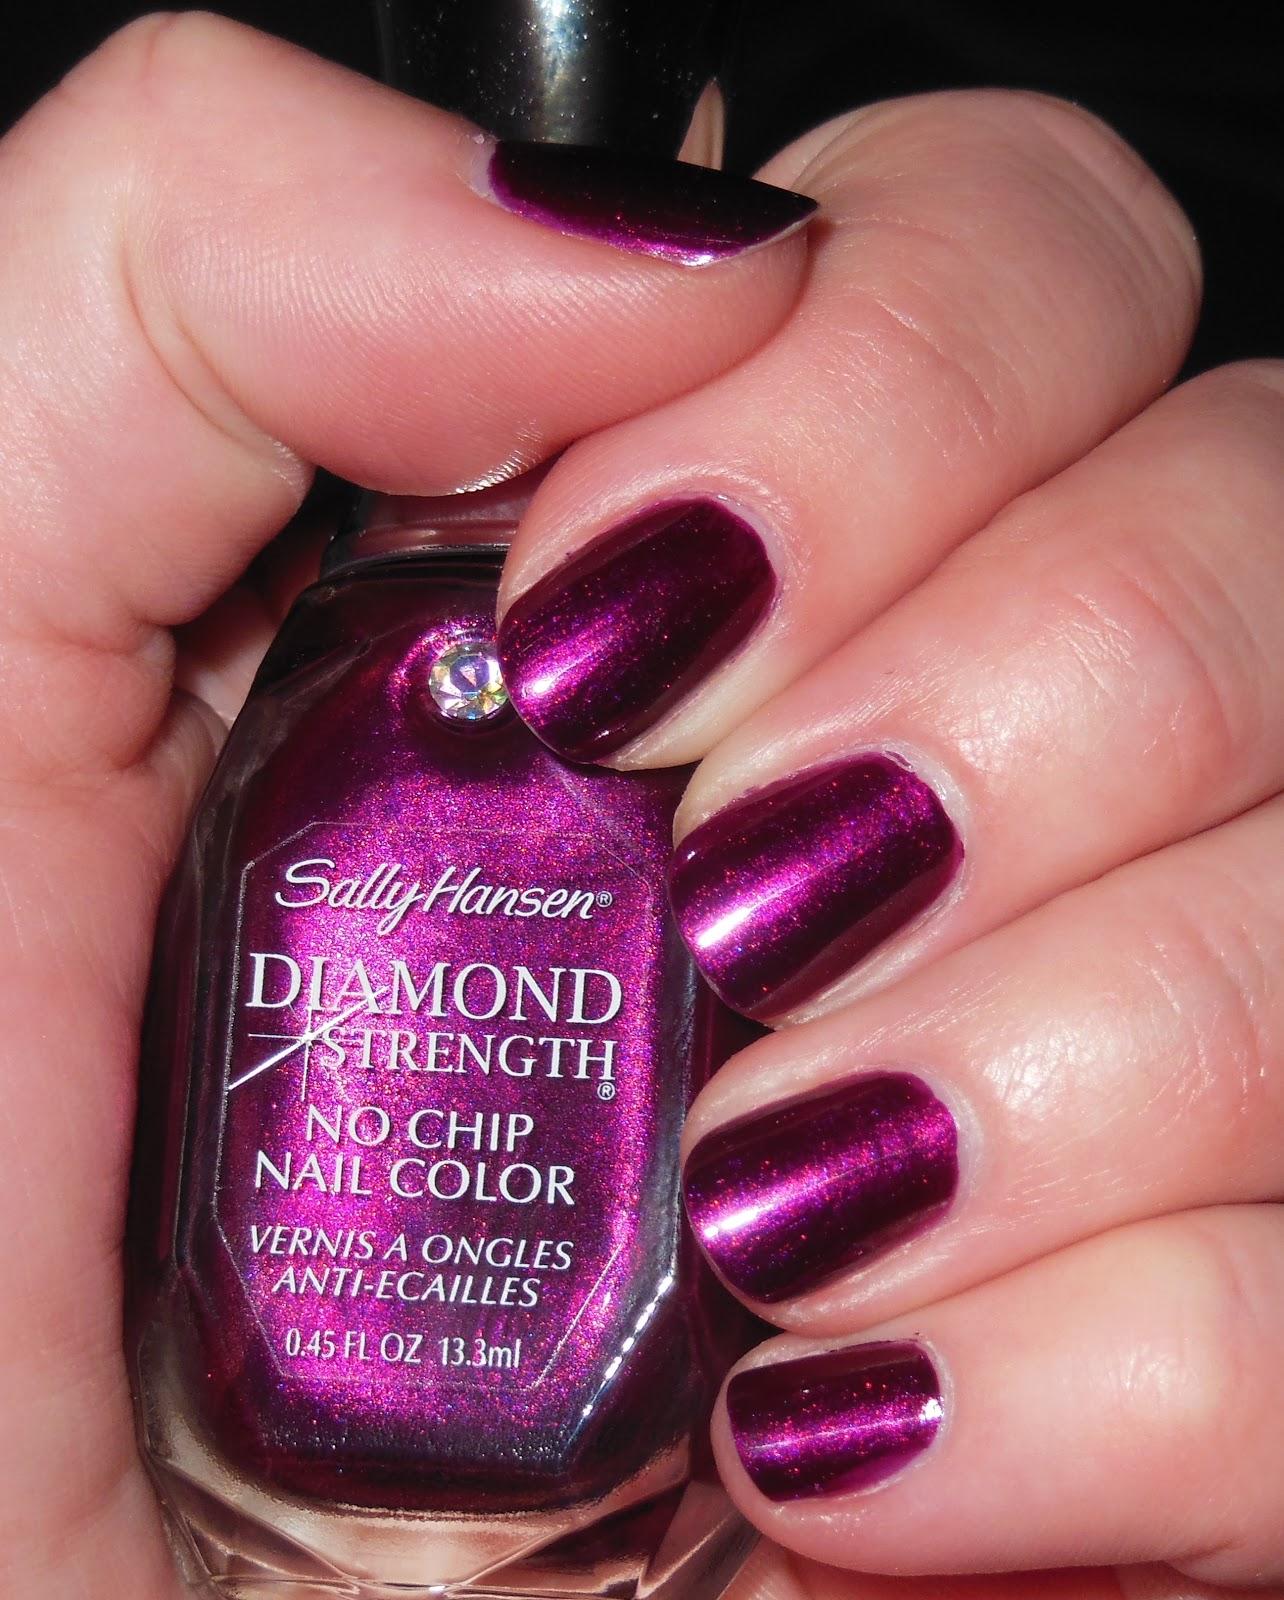 glambunctious!: REVIEW! | Sally Hansen Diamond Strength No Chip Nail ...